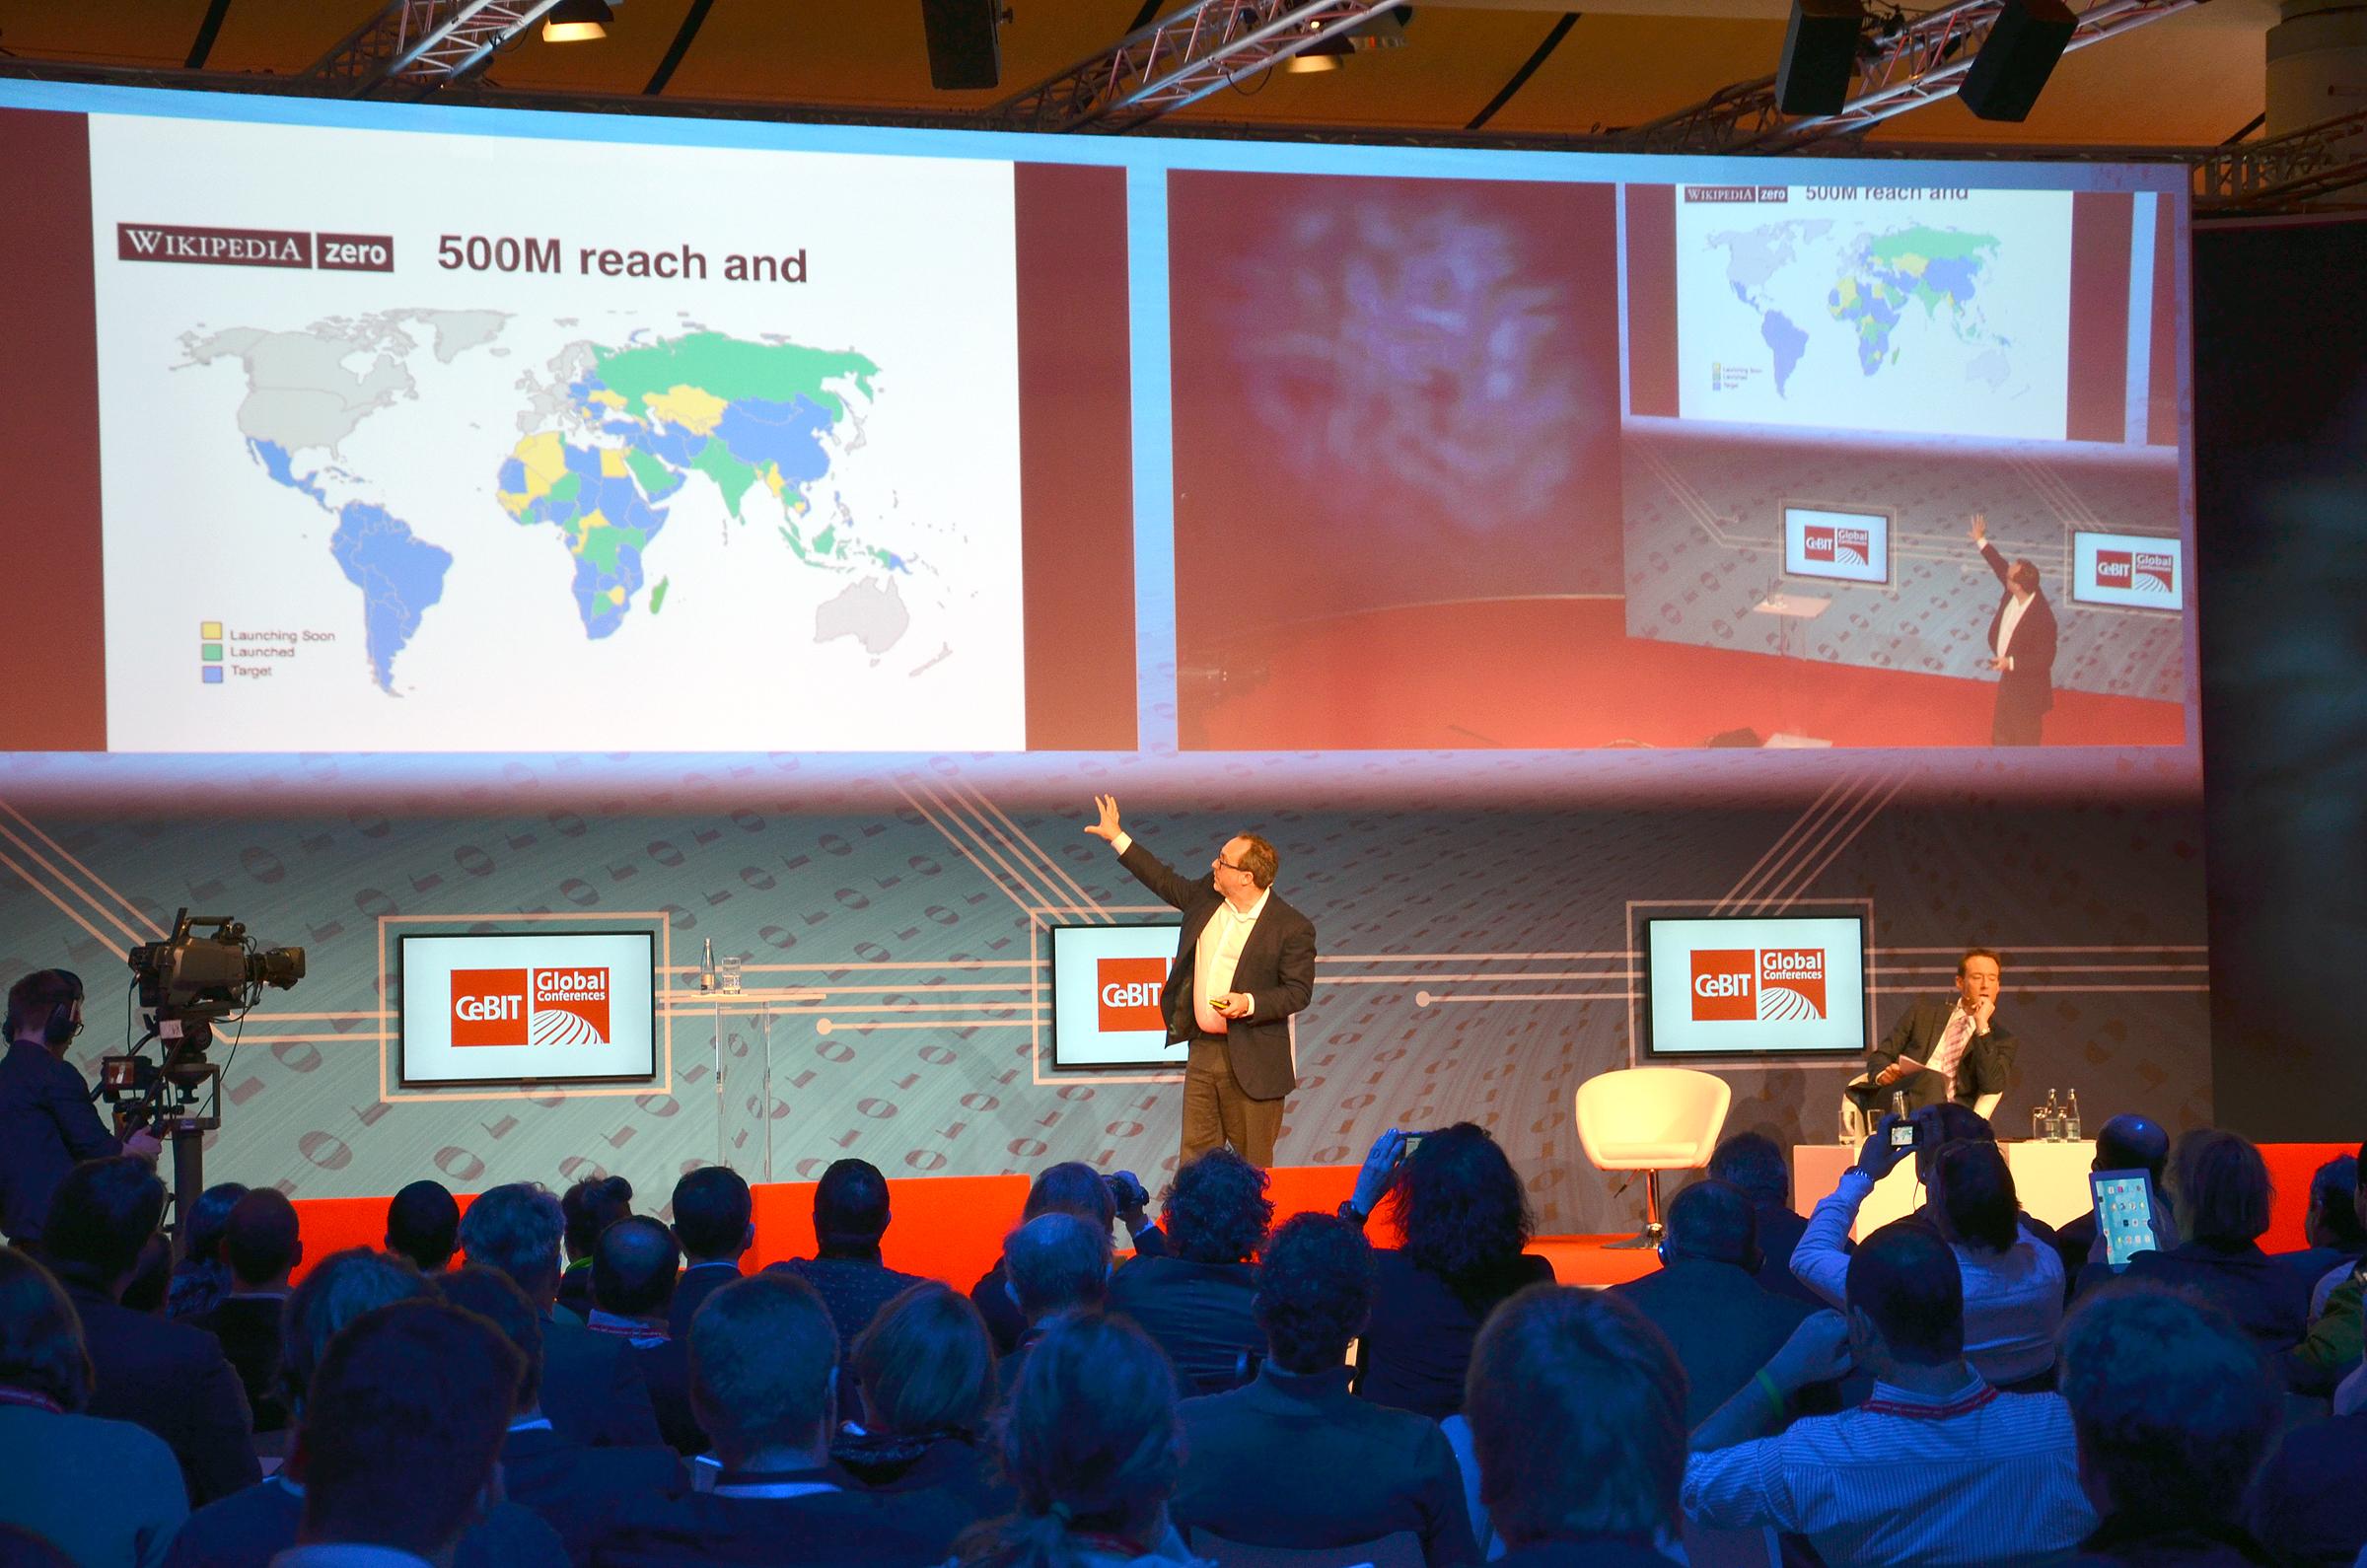 Jimmy Wales 2014 on CeBIT Global Conferences, Wikipedia Zero